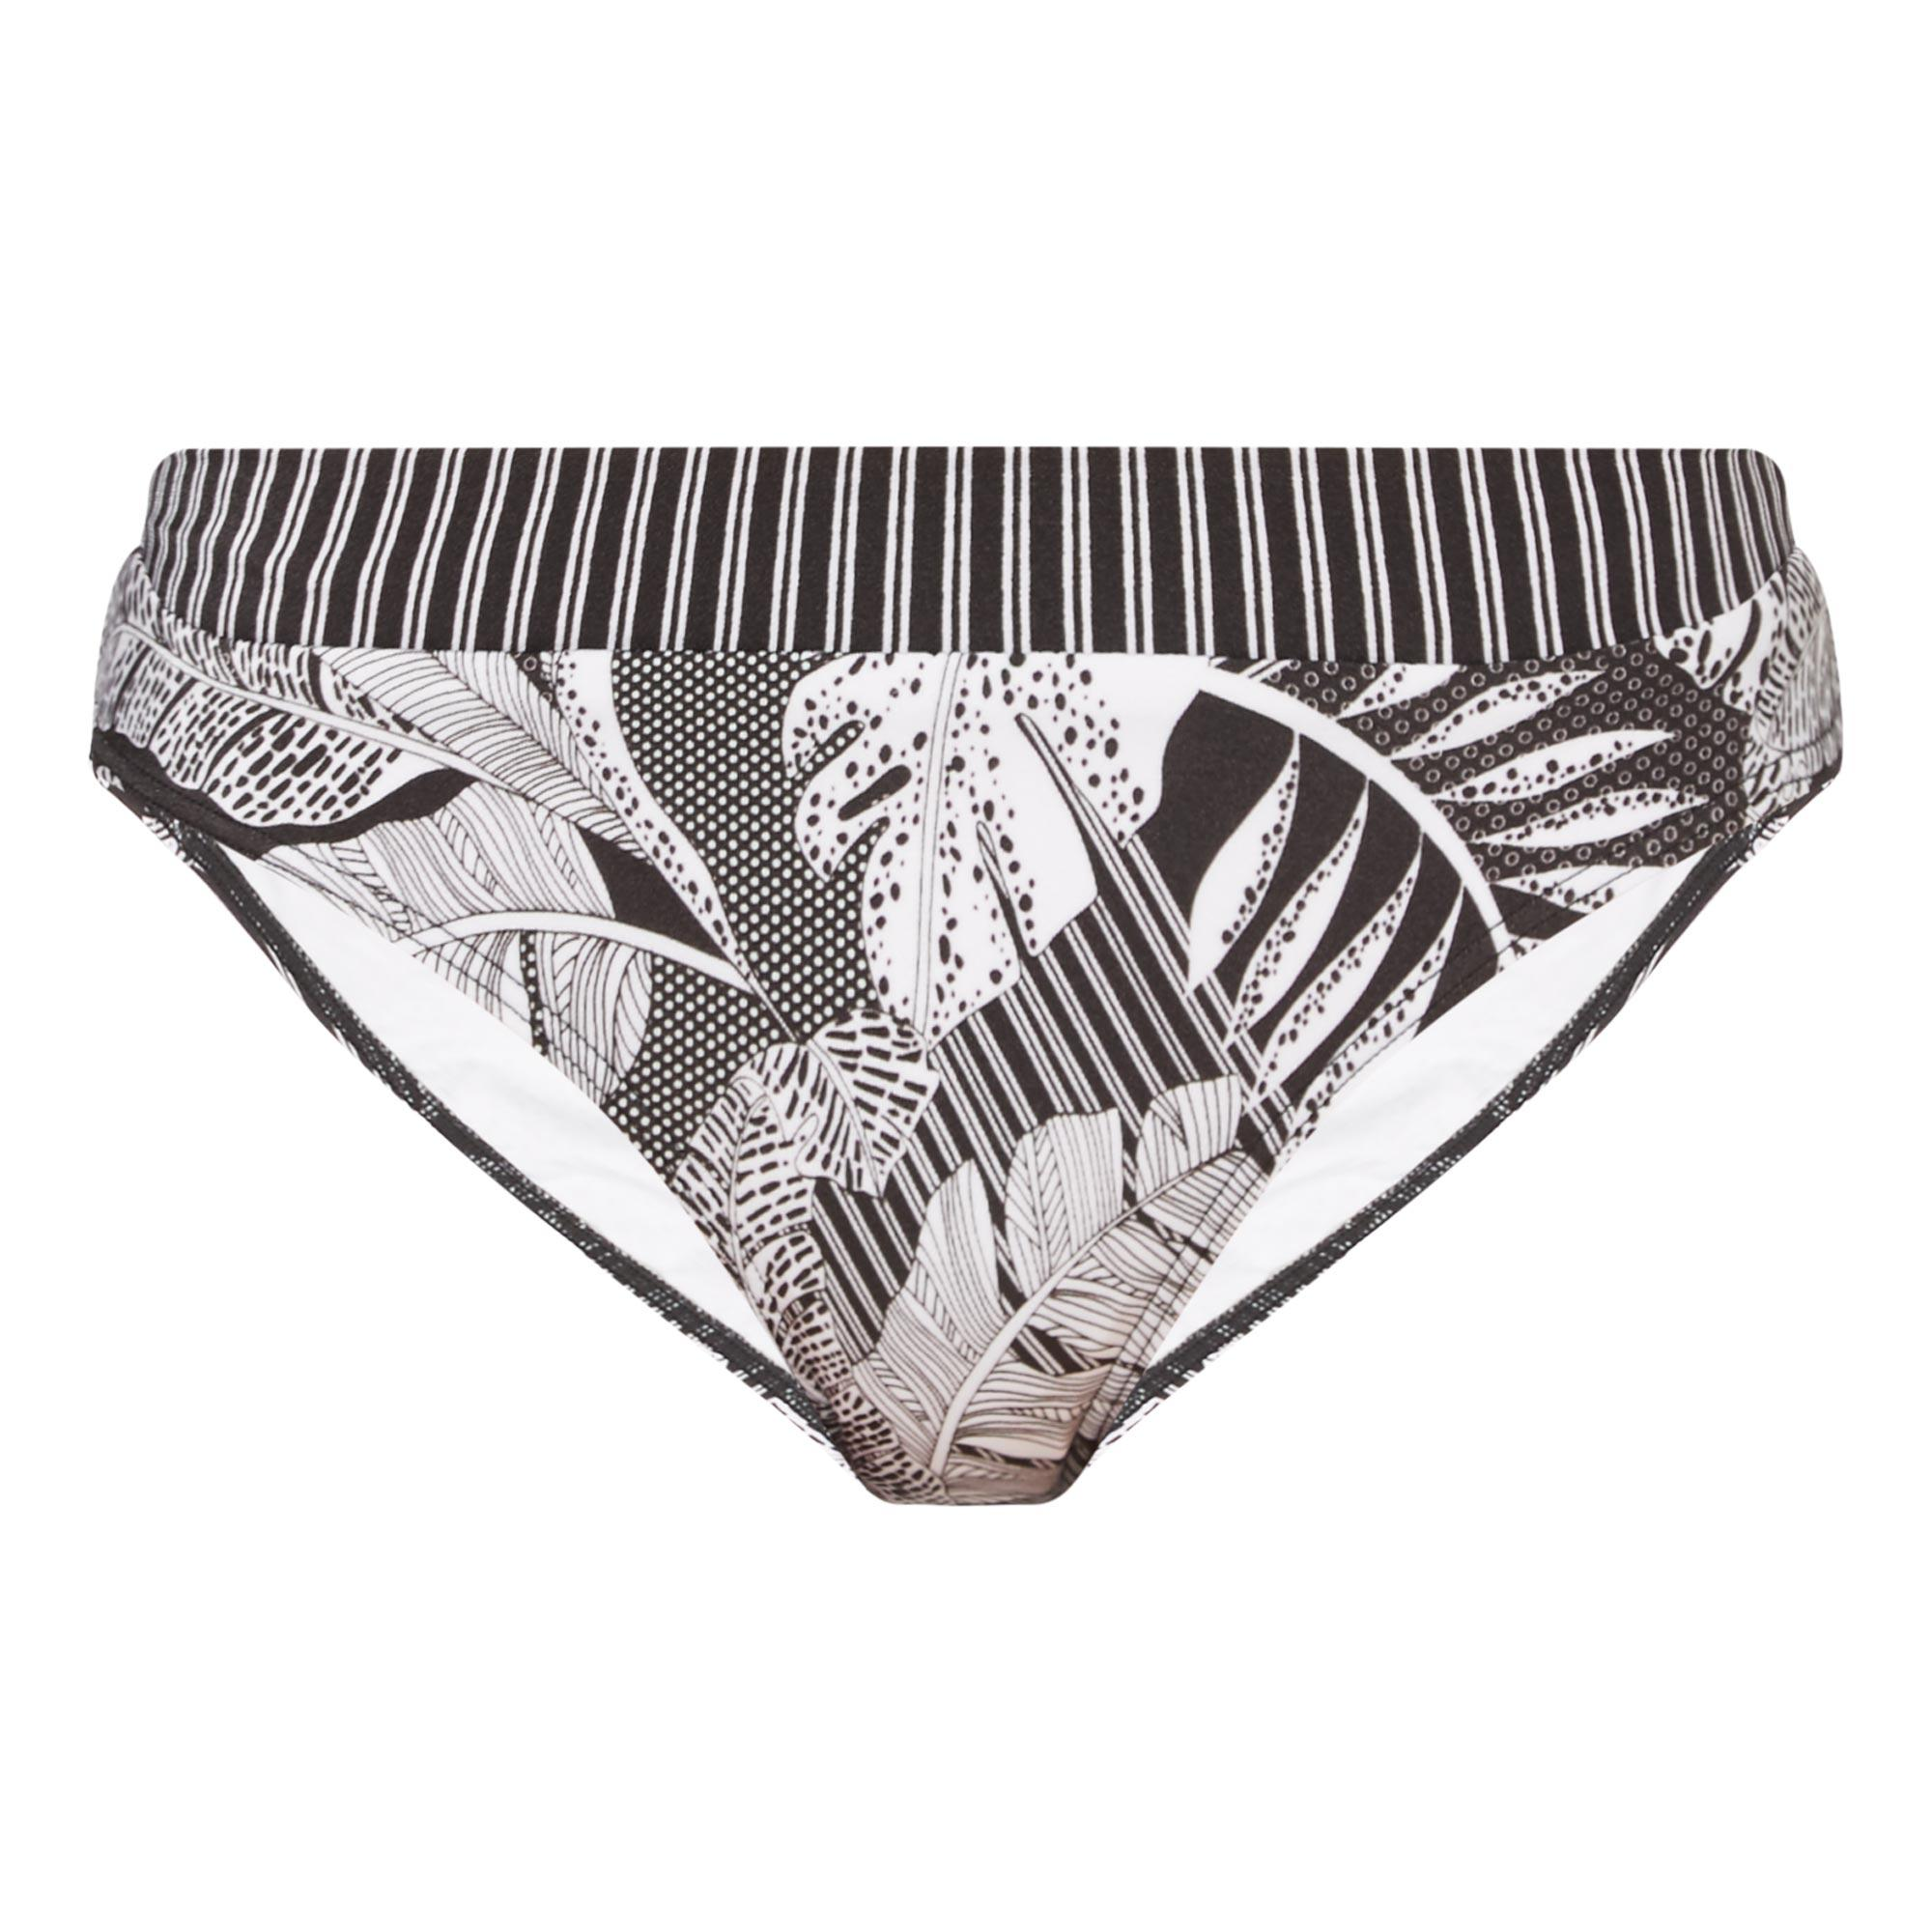 Tranquility Tropical Print Bikini Briefs